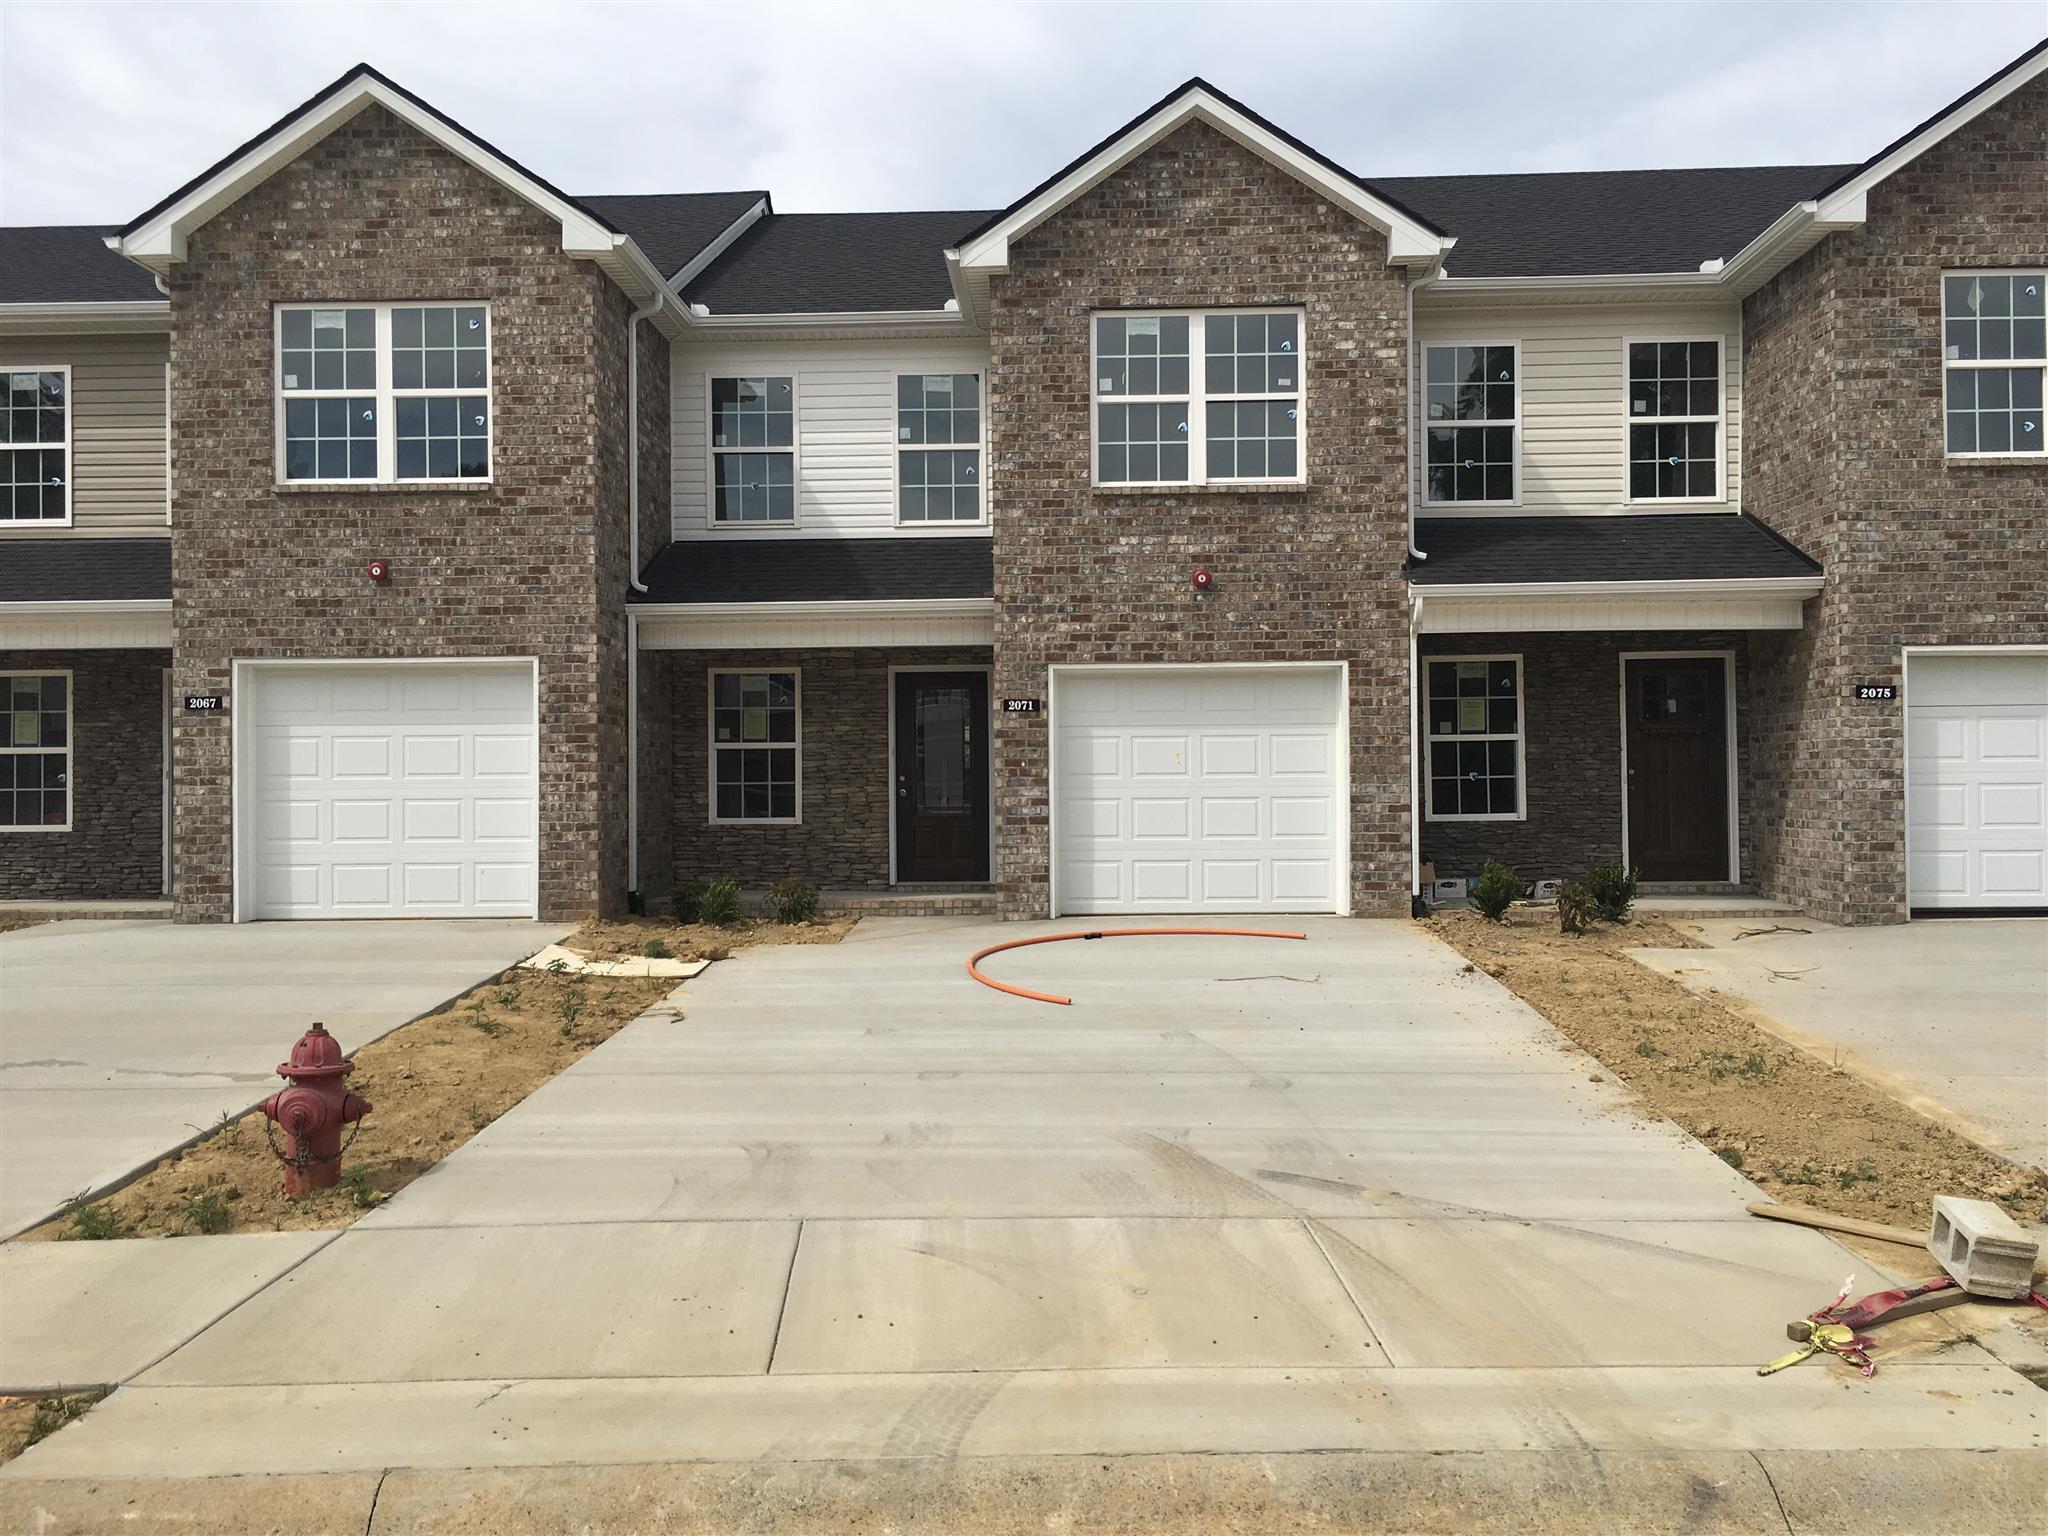 2071 Downstream lot 25, Ashland City, TN 37015 - Ashland City, TN real estate listing